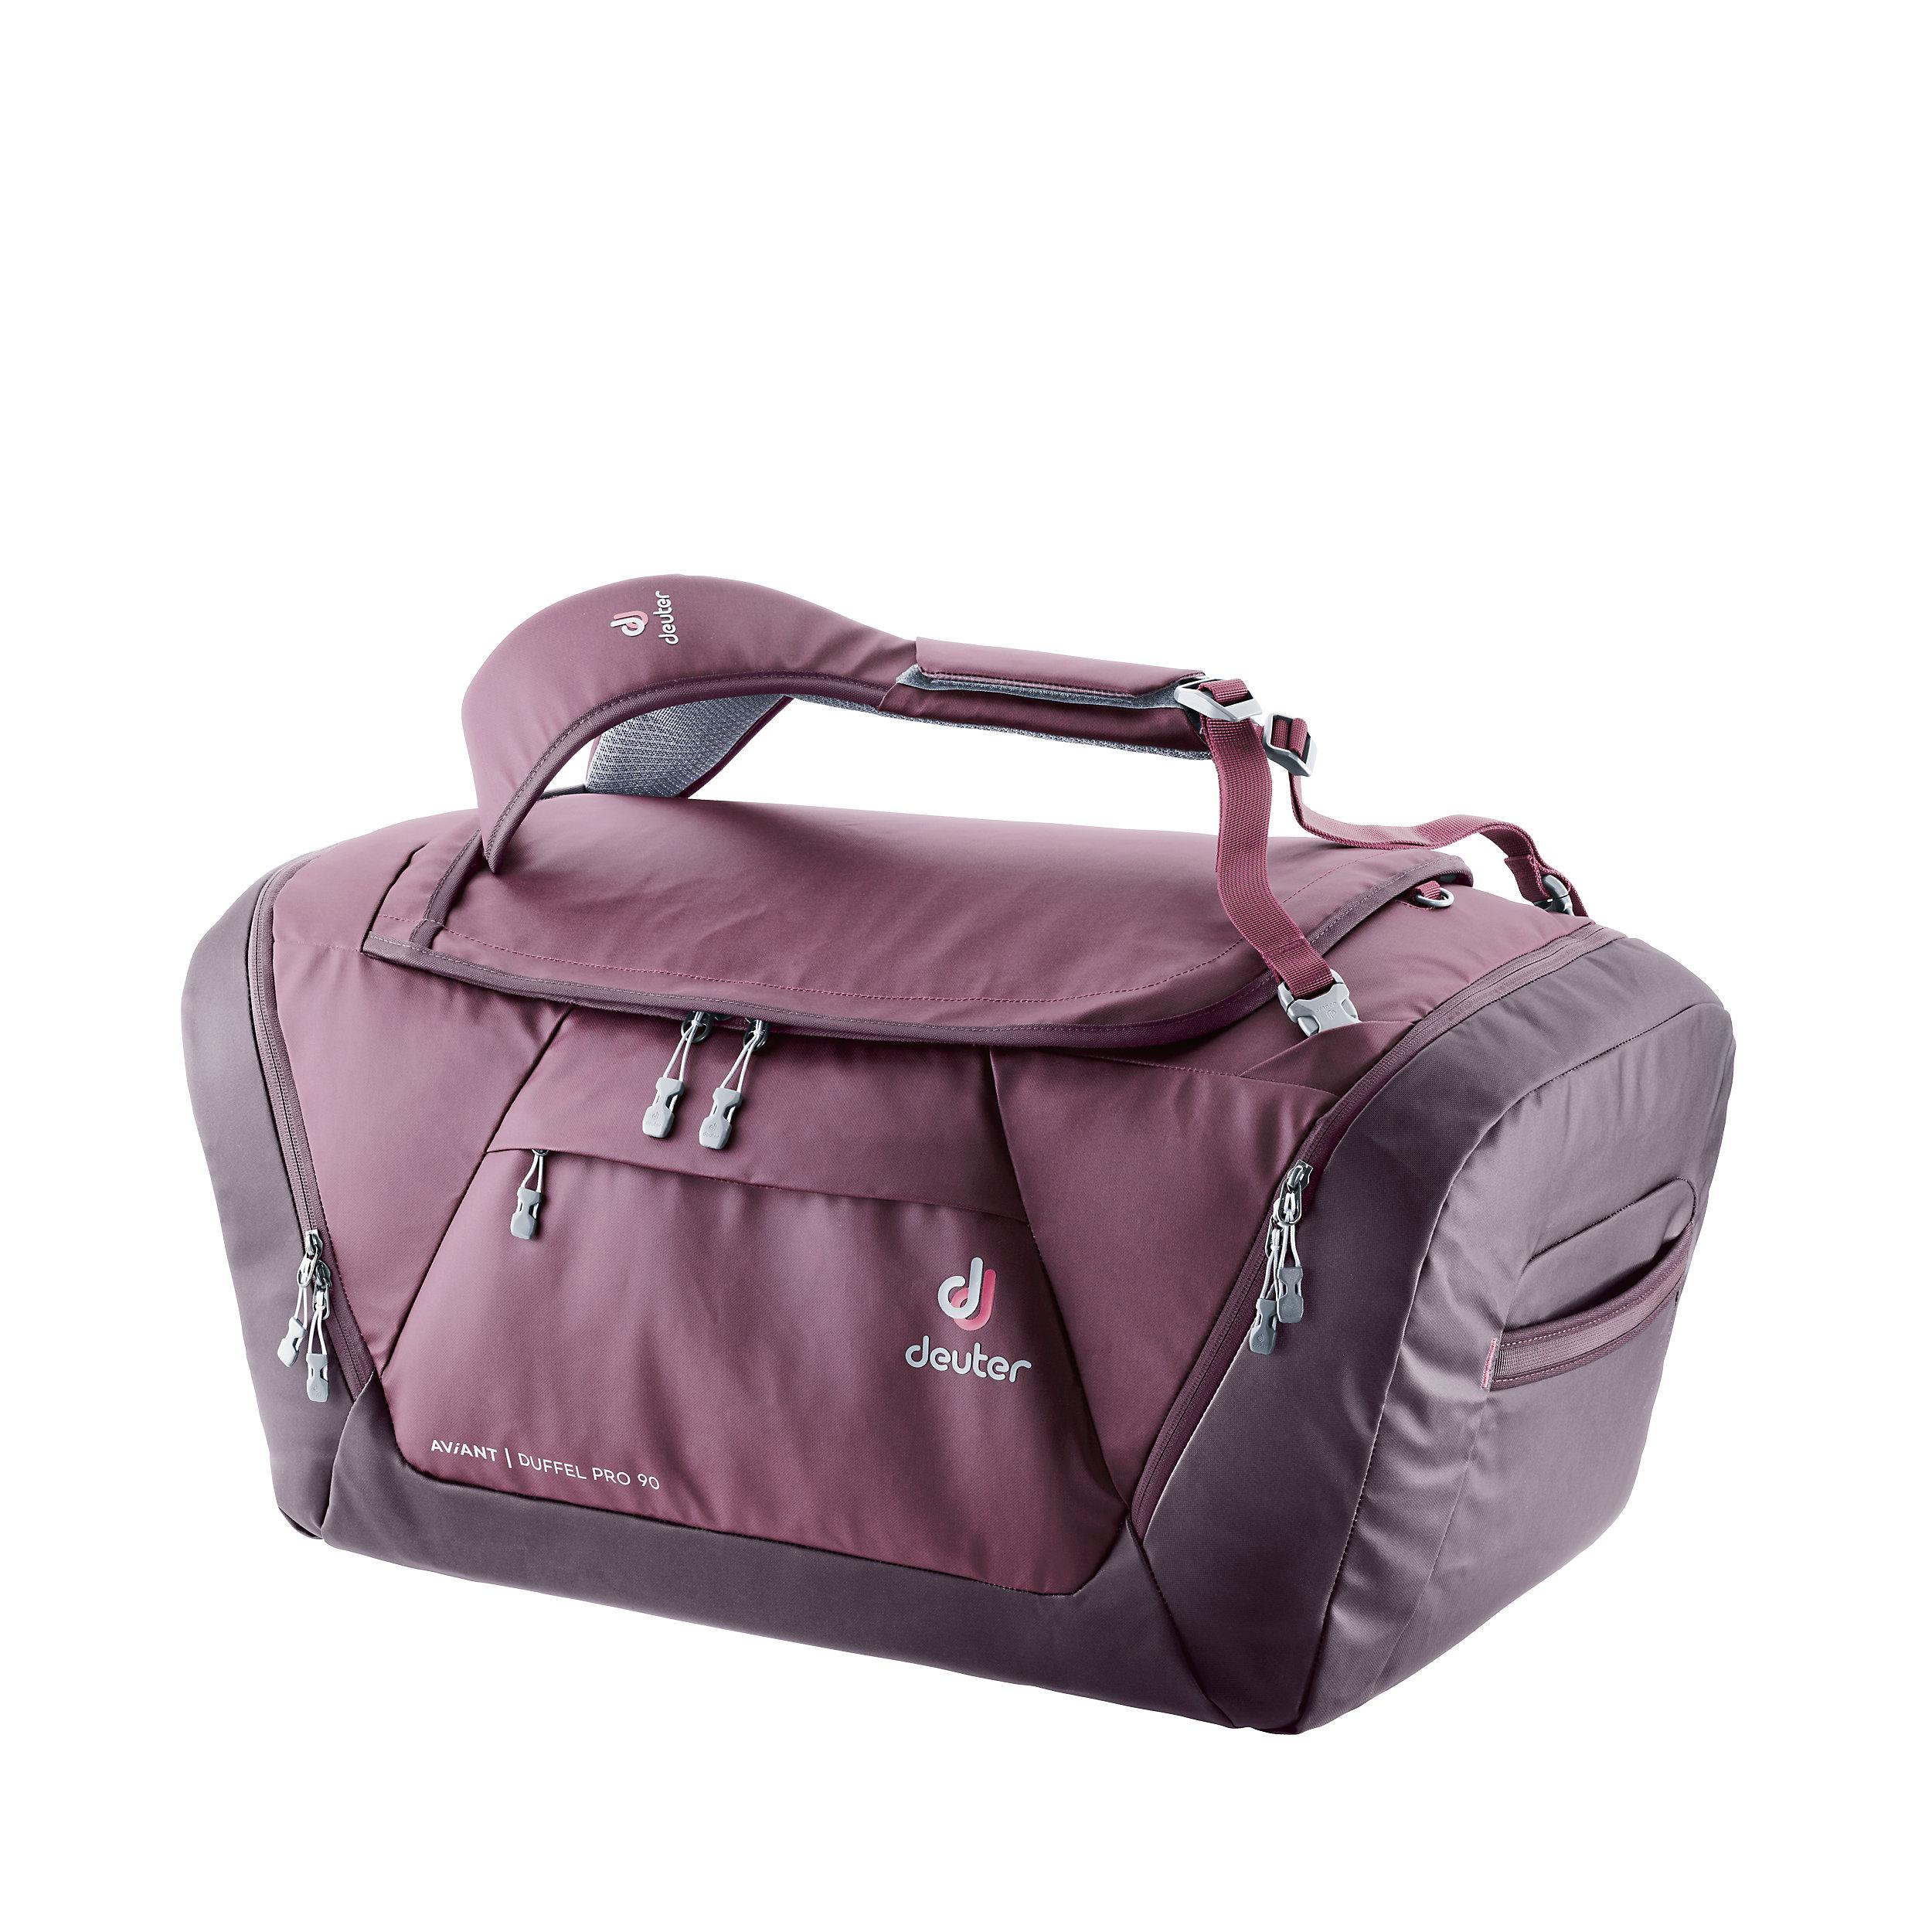 Travel Bag AViANT Duffel Pro 90 AViANT Series